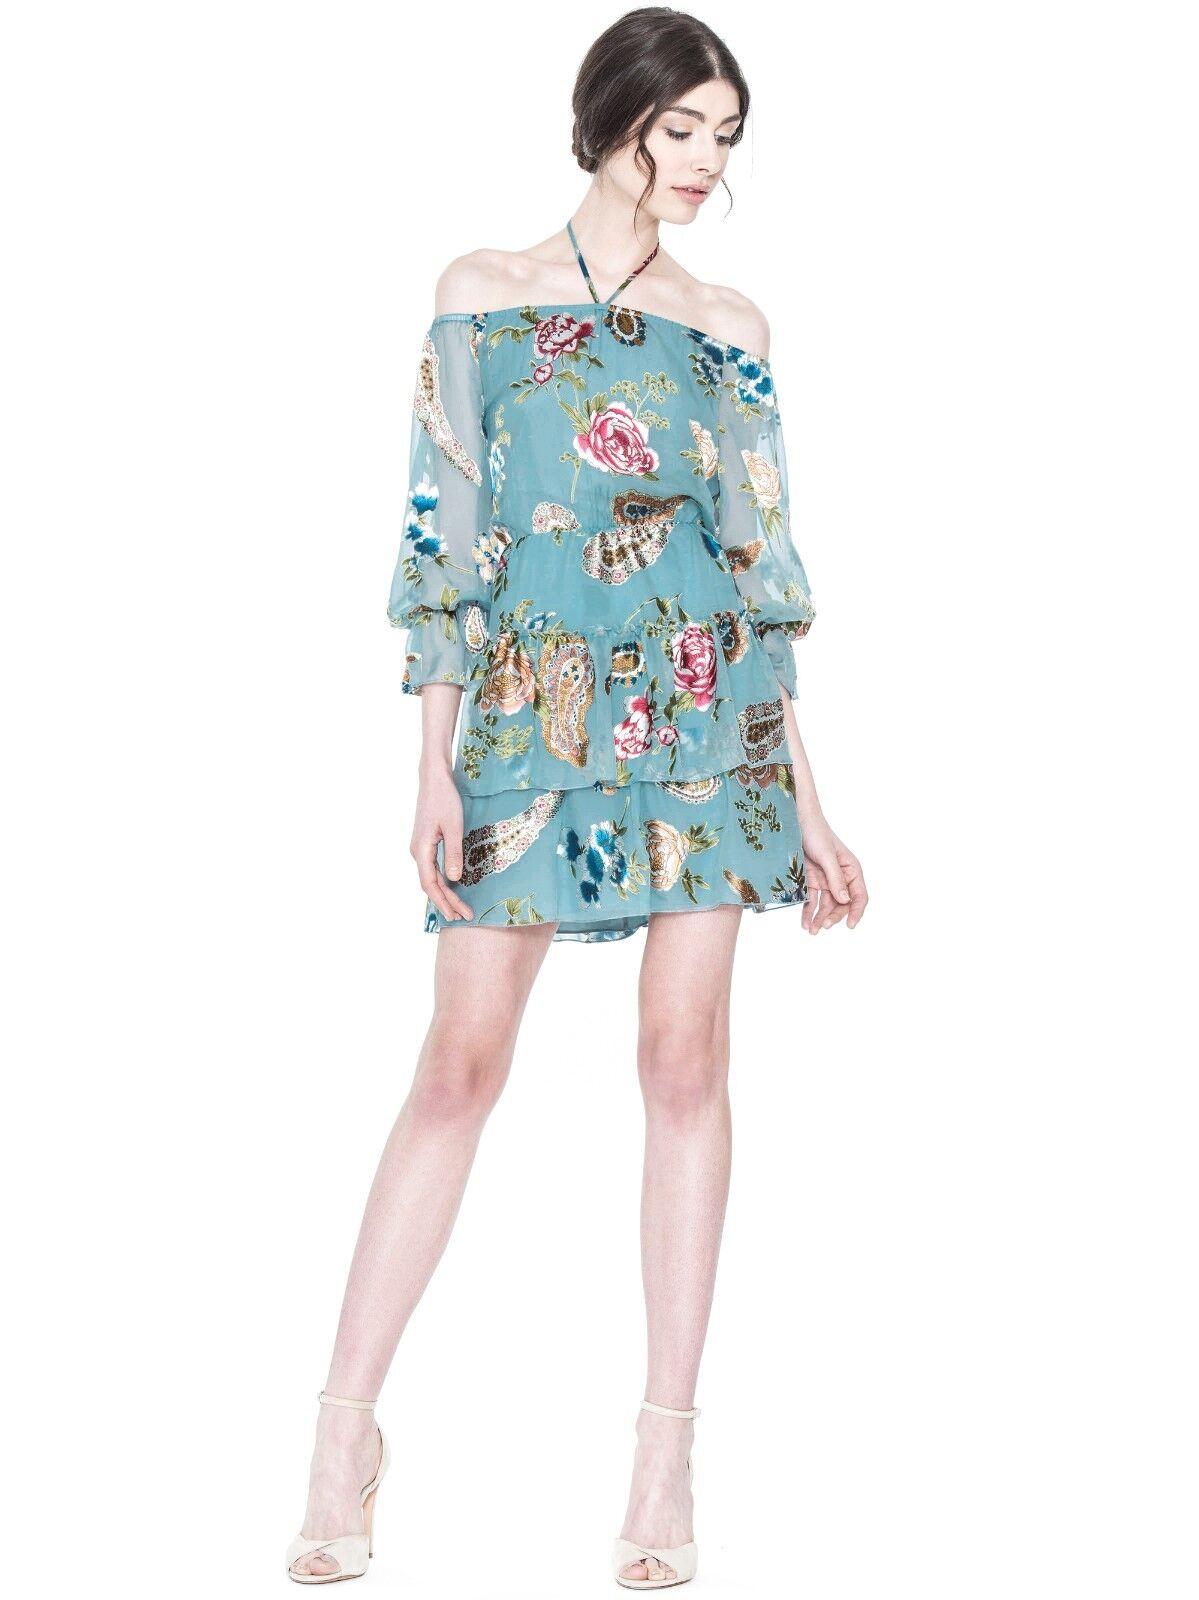 NWD Alice + Olivia Waylon Dress in Aqua Multi - Größe 6